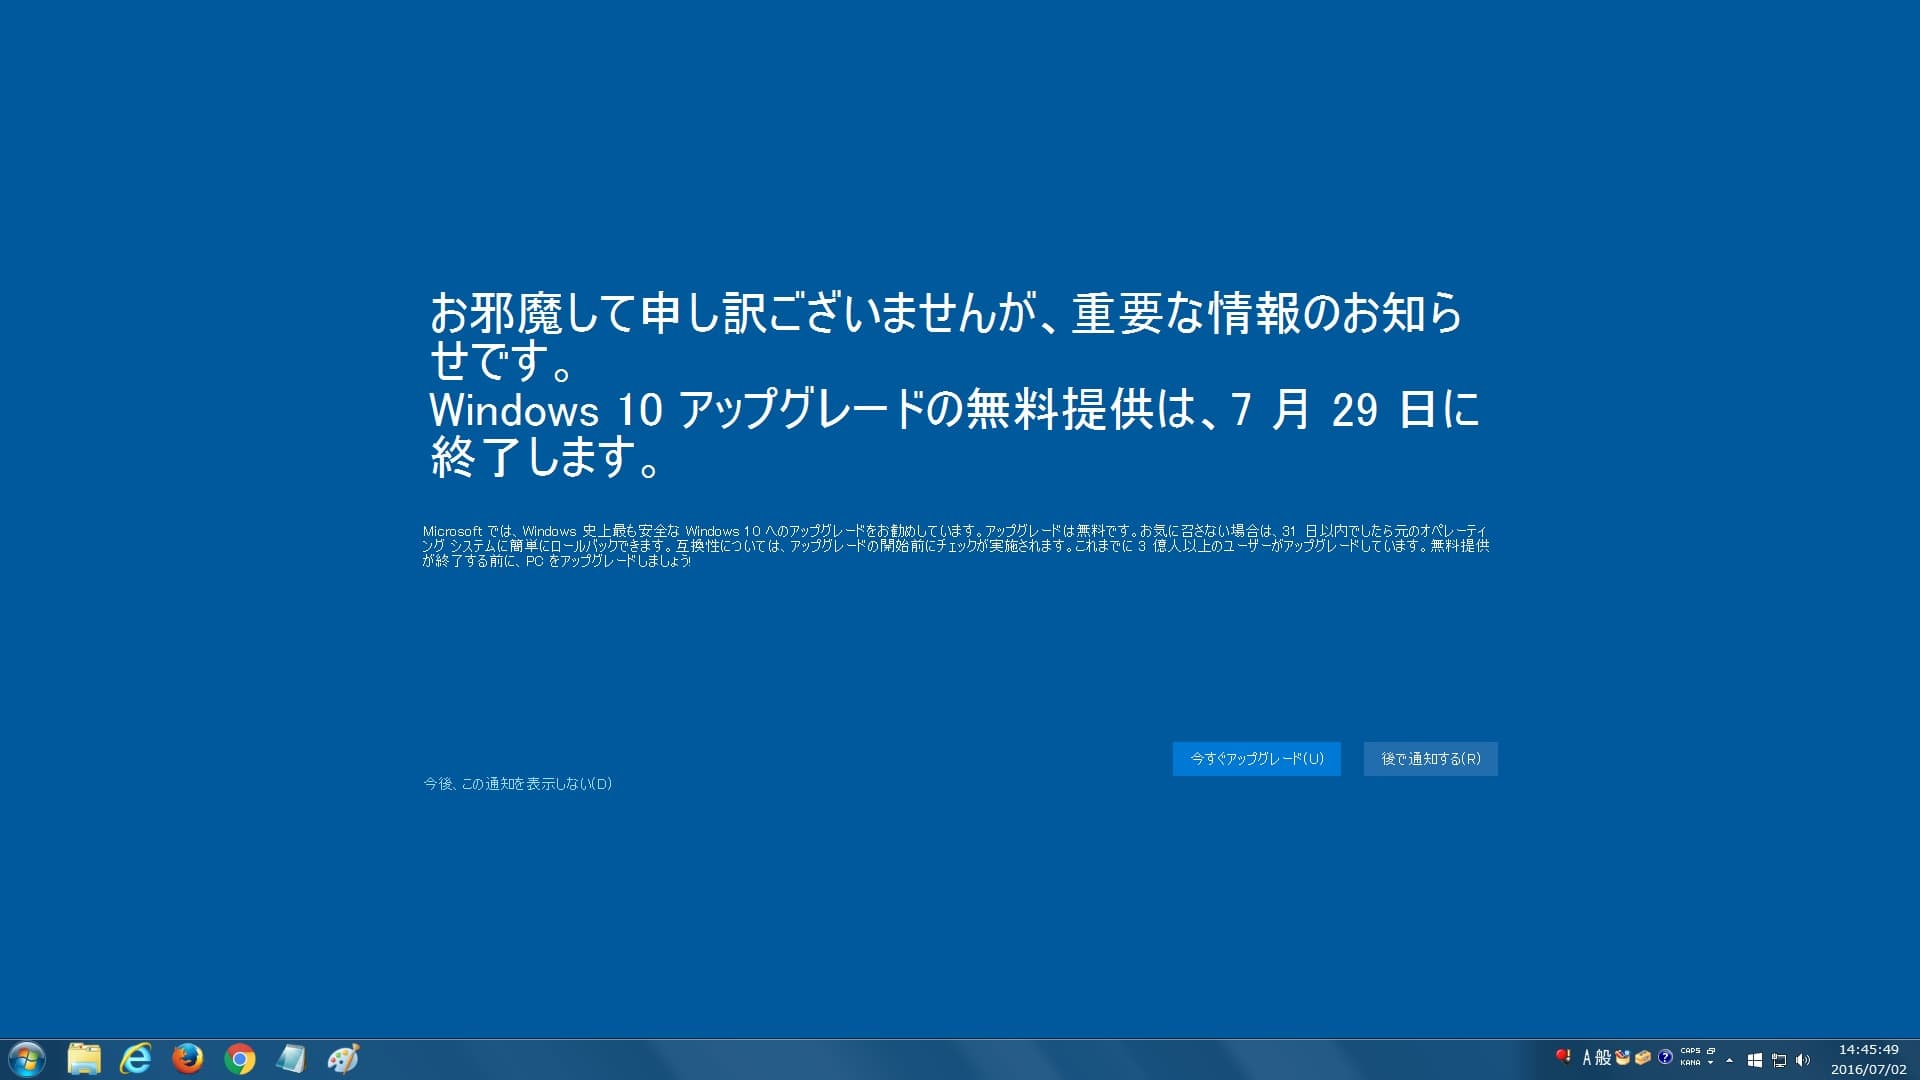 http://art33.photozou.jp/pub/119/2912119/photo/238324346_org.v1467439622.jpg